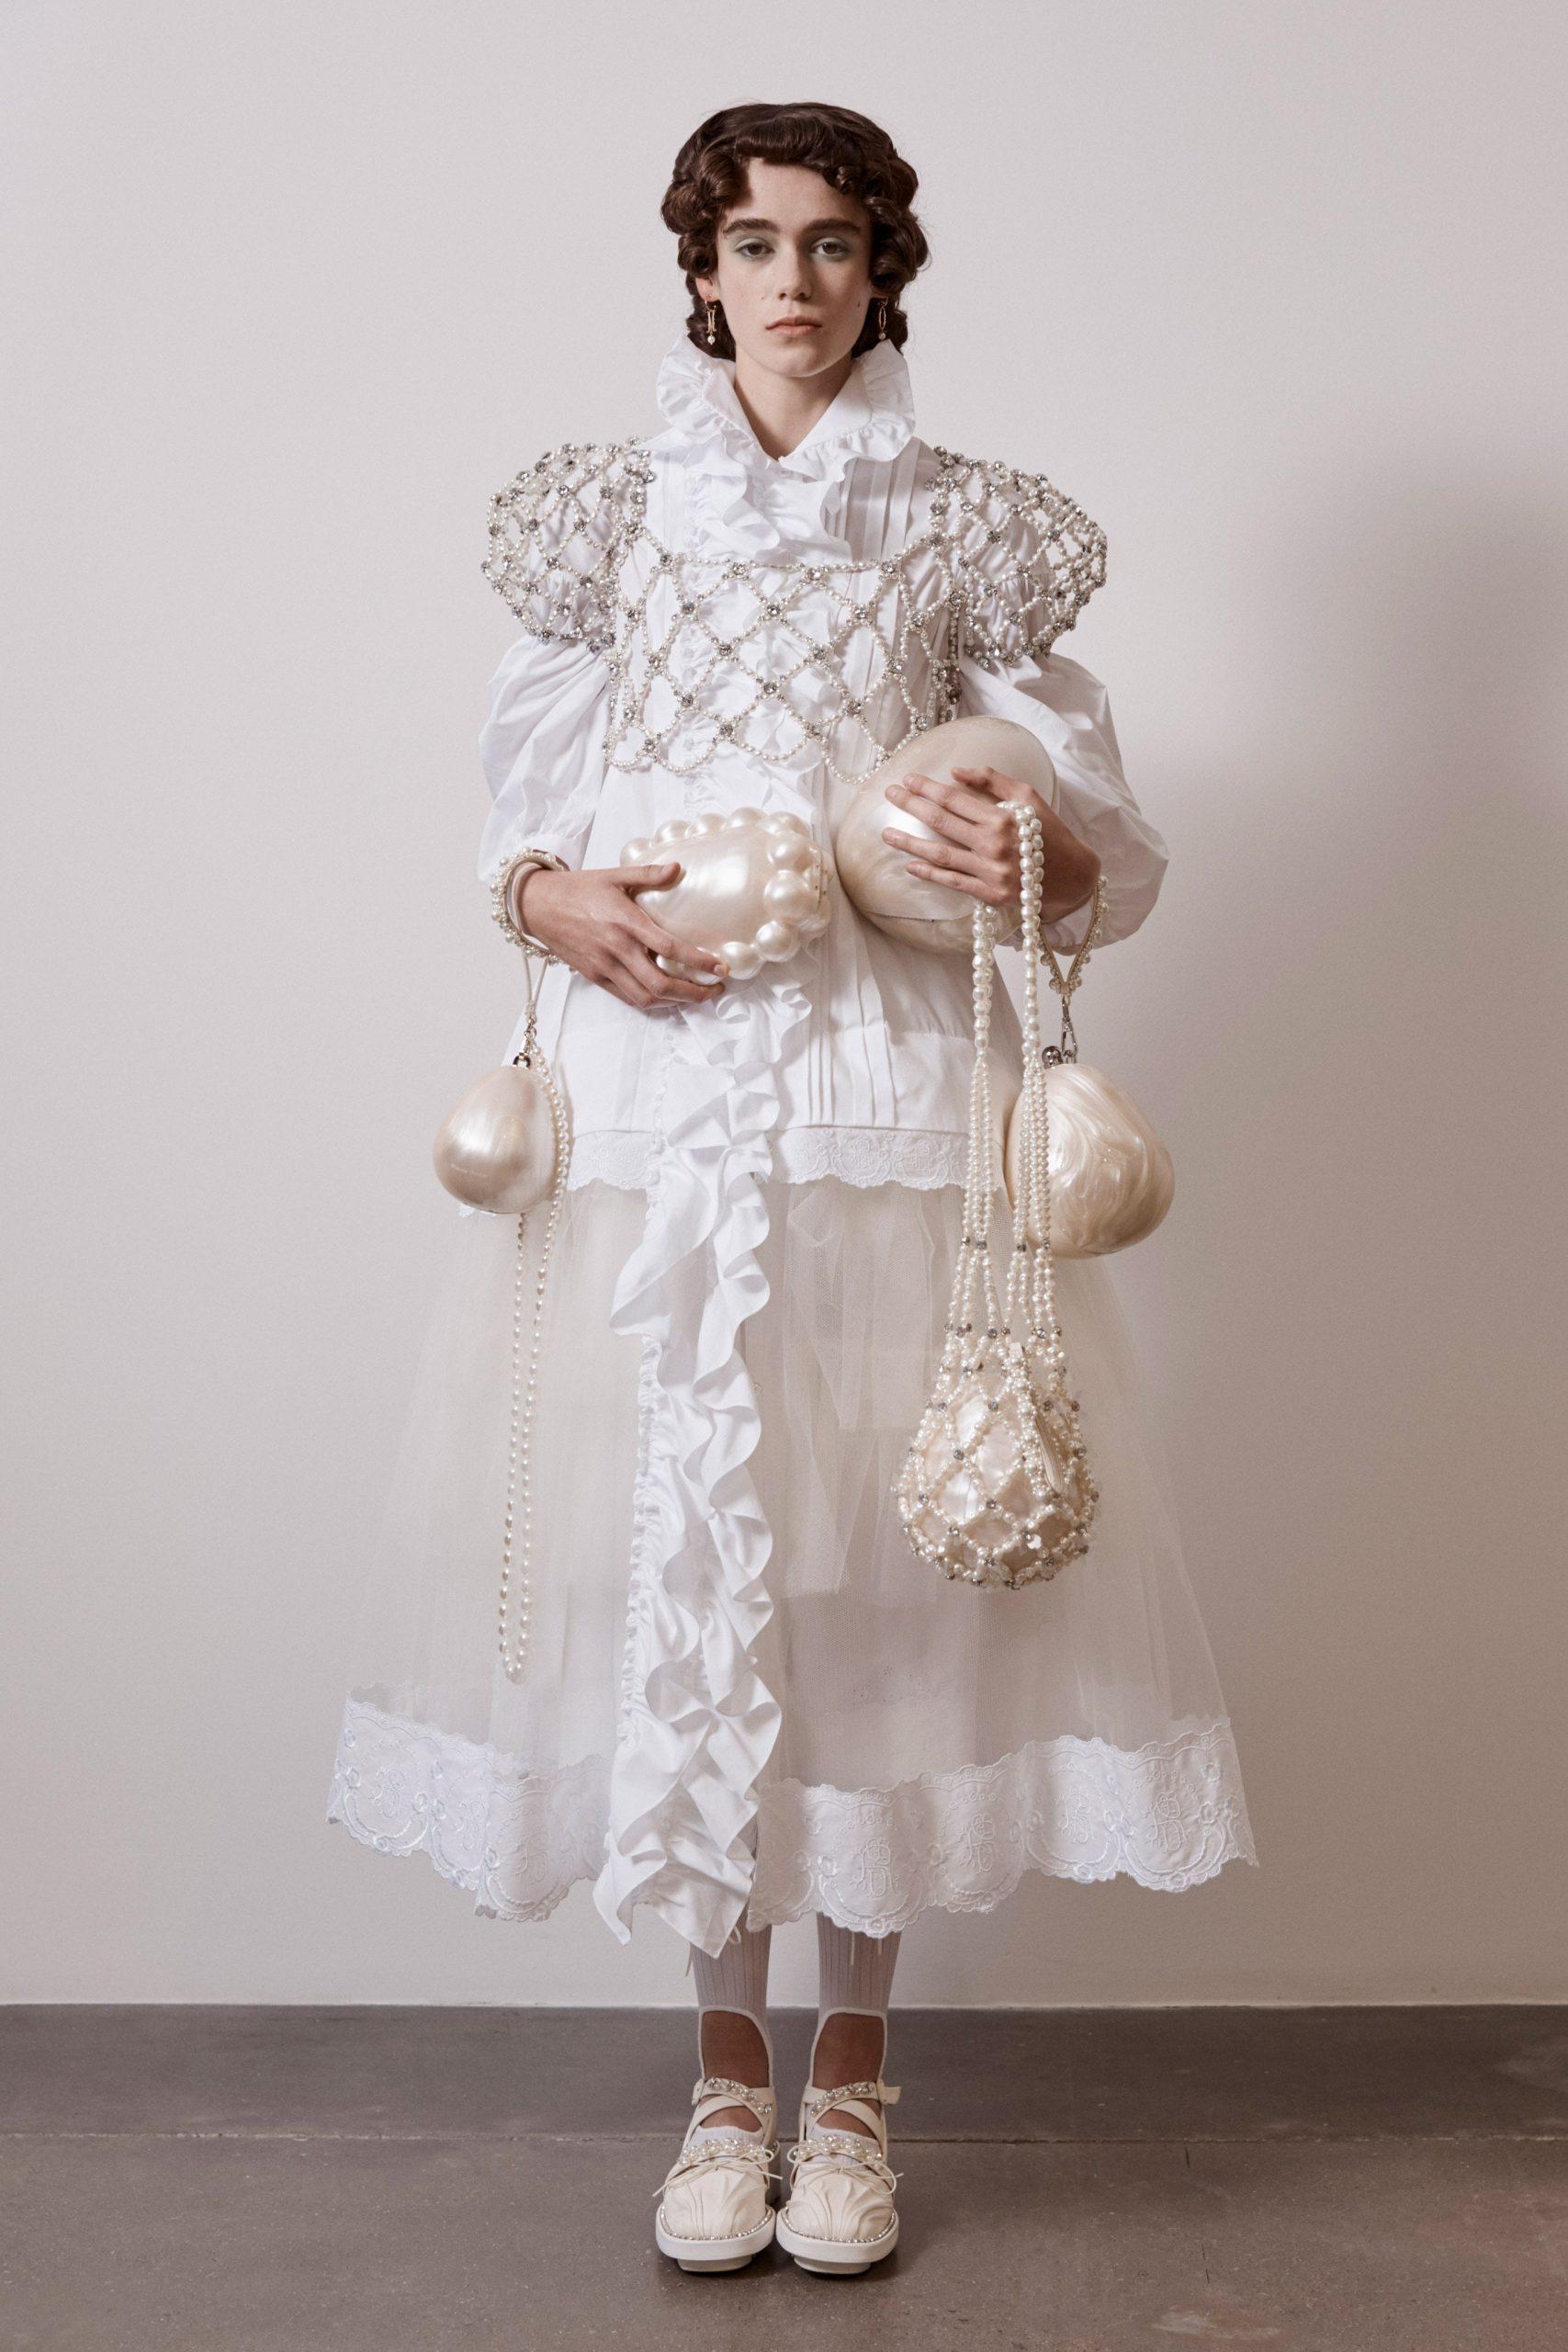 Simone Rocha Spring 2021, vestidos de novia 2021 Simone Rocha - Wedding Hub - 06